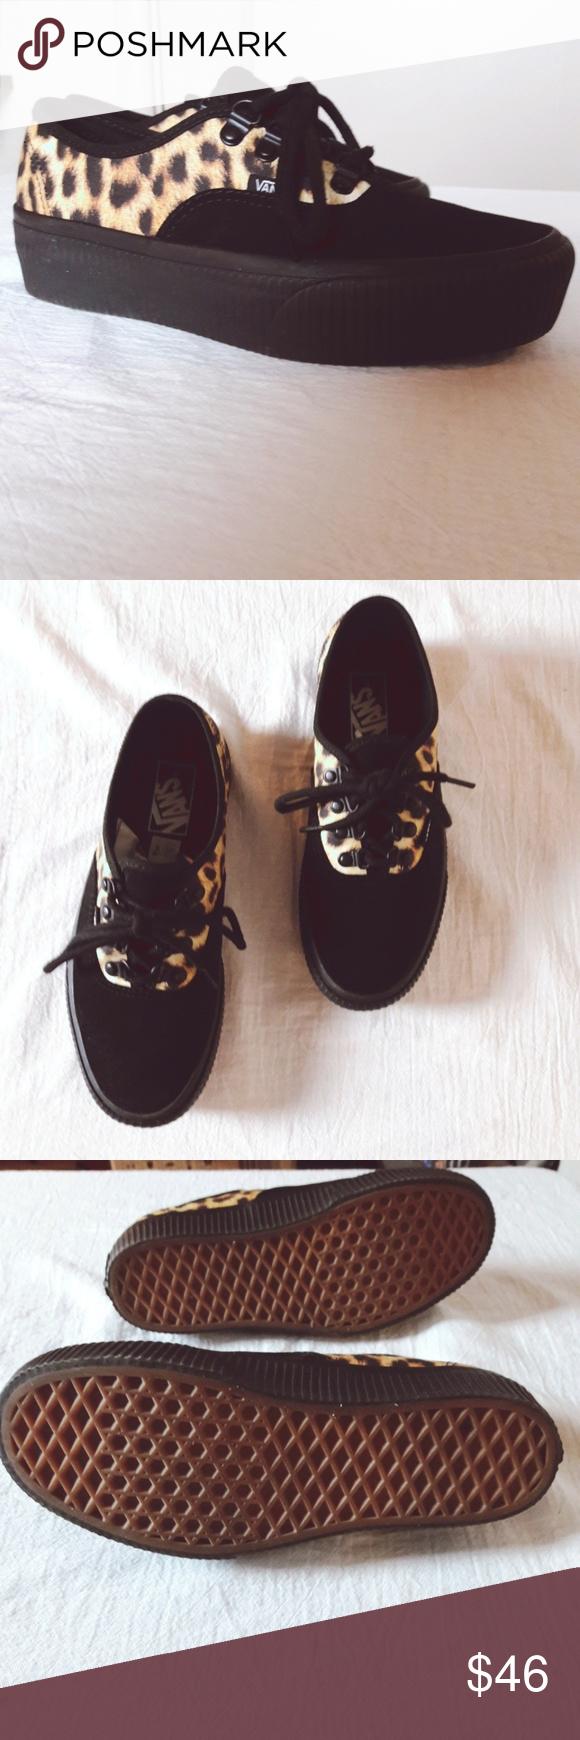 4f51e6b33d16 Vans Black Leopard Suede Creeper Sneakers Punk 80s Vans Leopard Black Suede  Creeper Sneakers Punk Goth